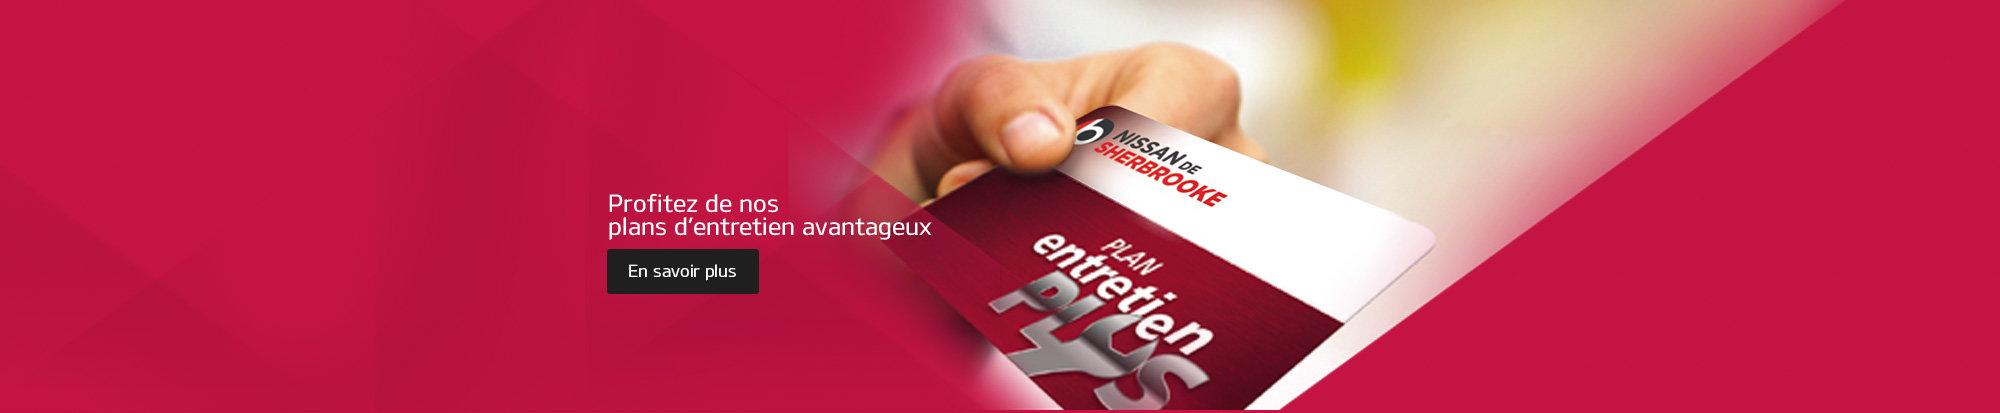 Entretien Plus-Nissan Sherbrooke